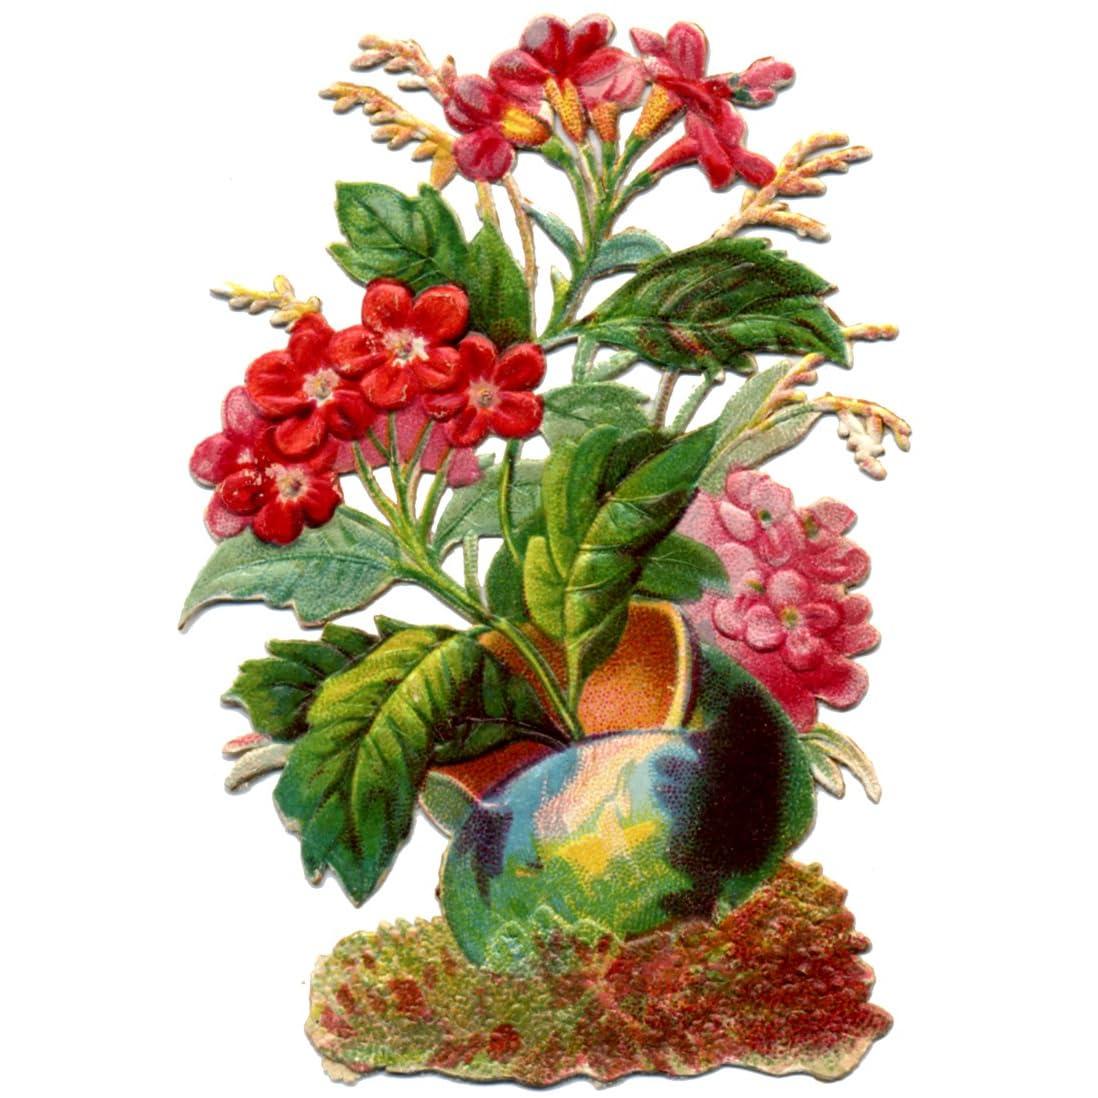 http://ecx.images-amazon.com/images/I/71xgzd1U4yL._AA1098_.jpg